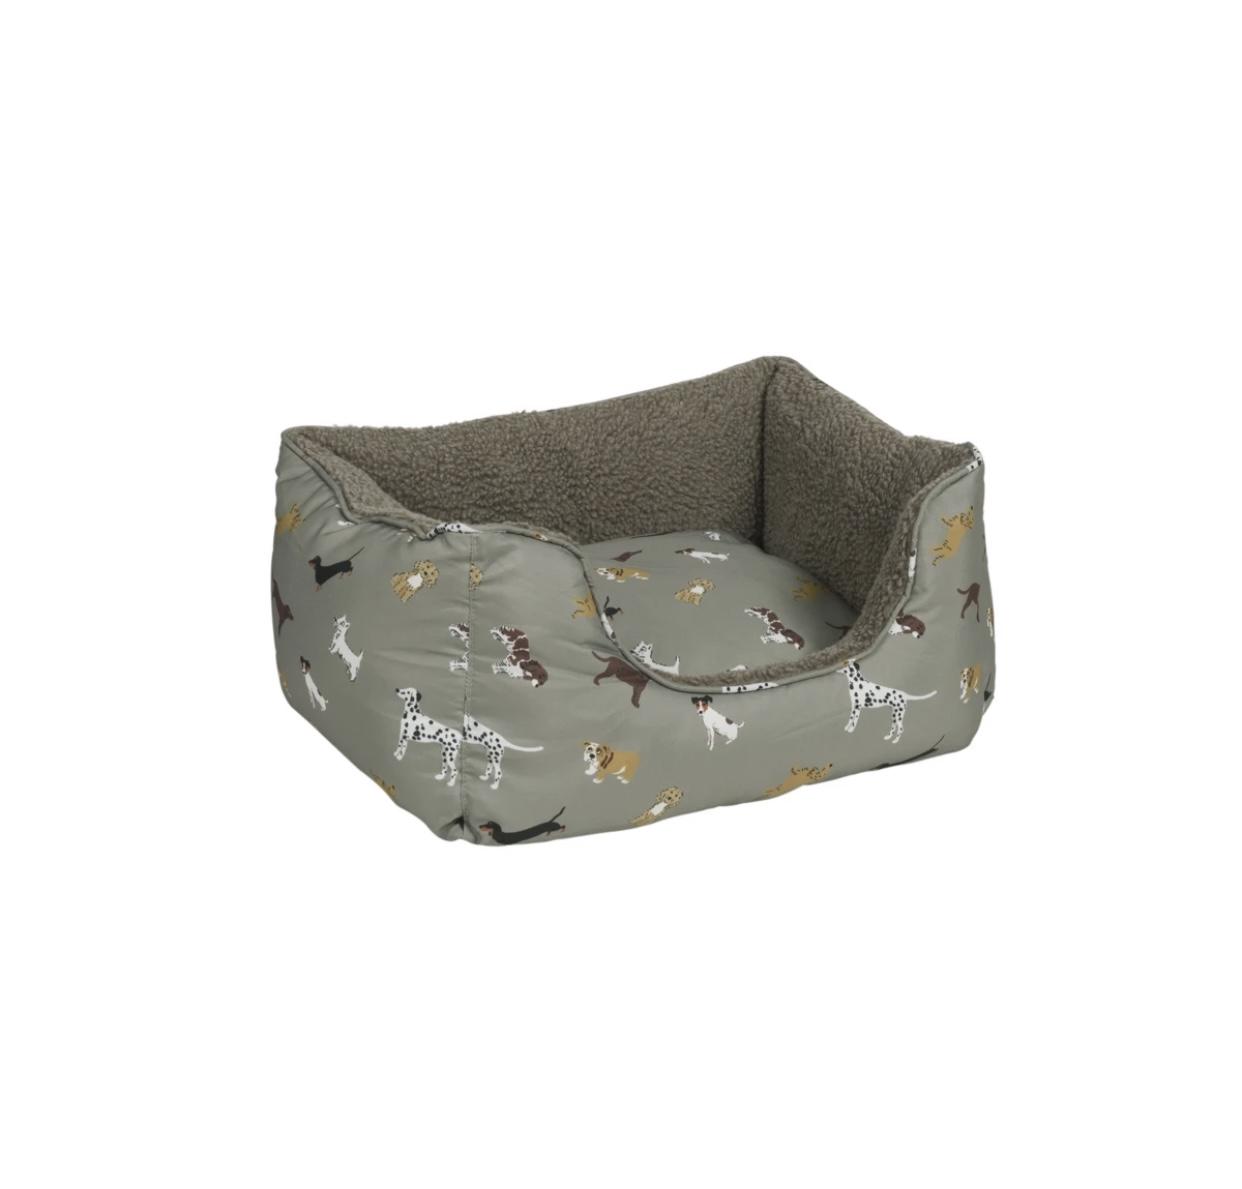 Fetch Dog Bed by Sophie Allport